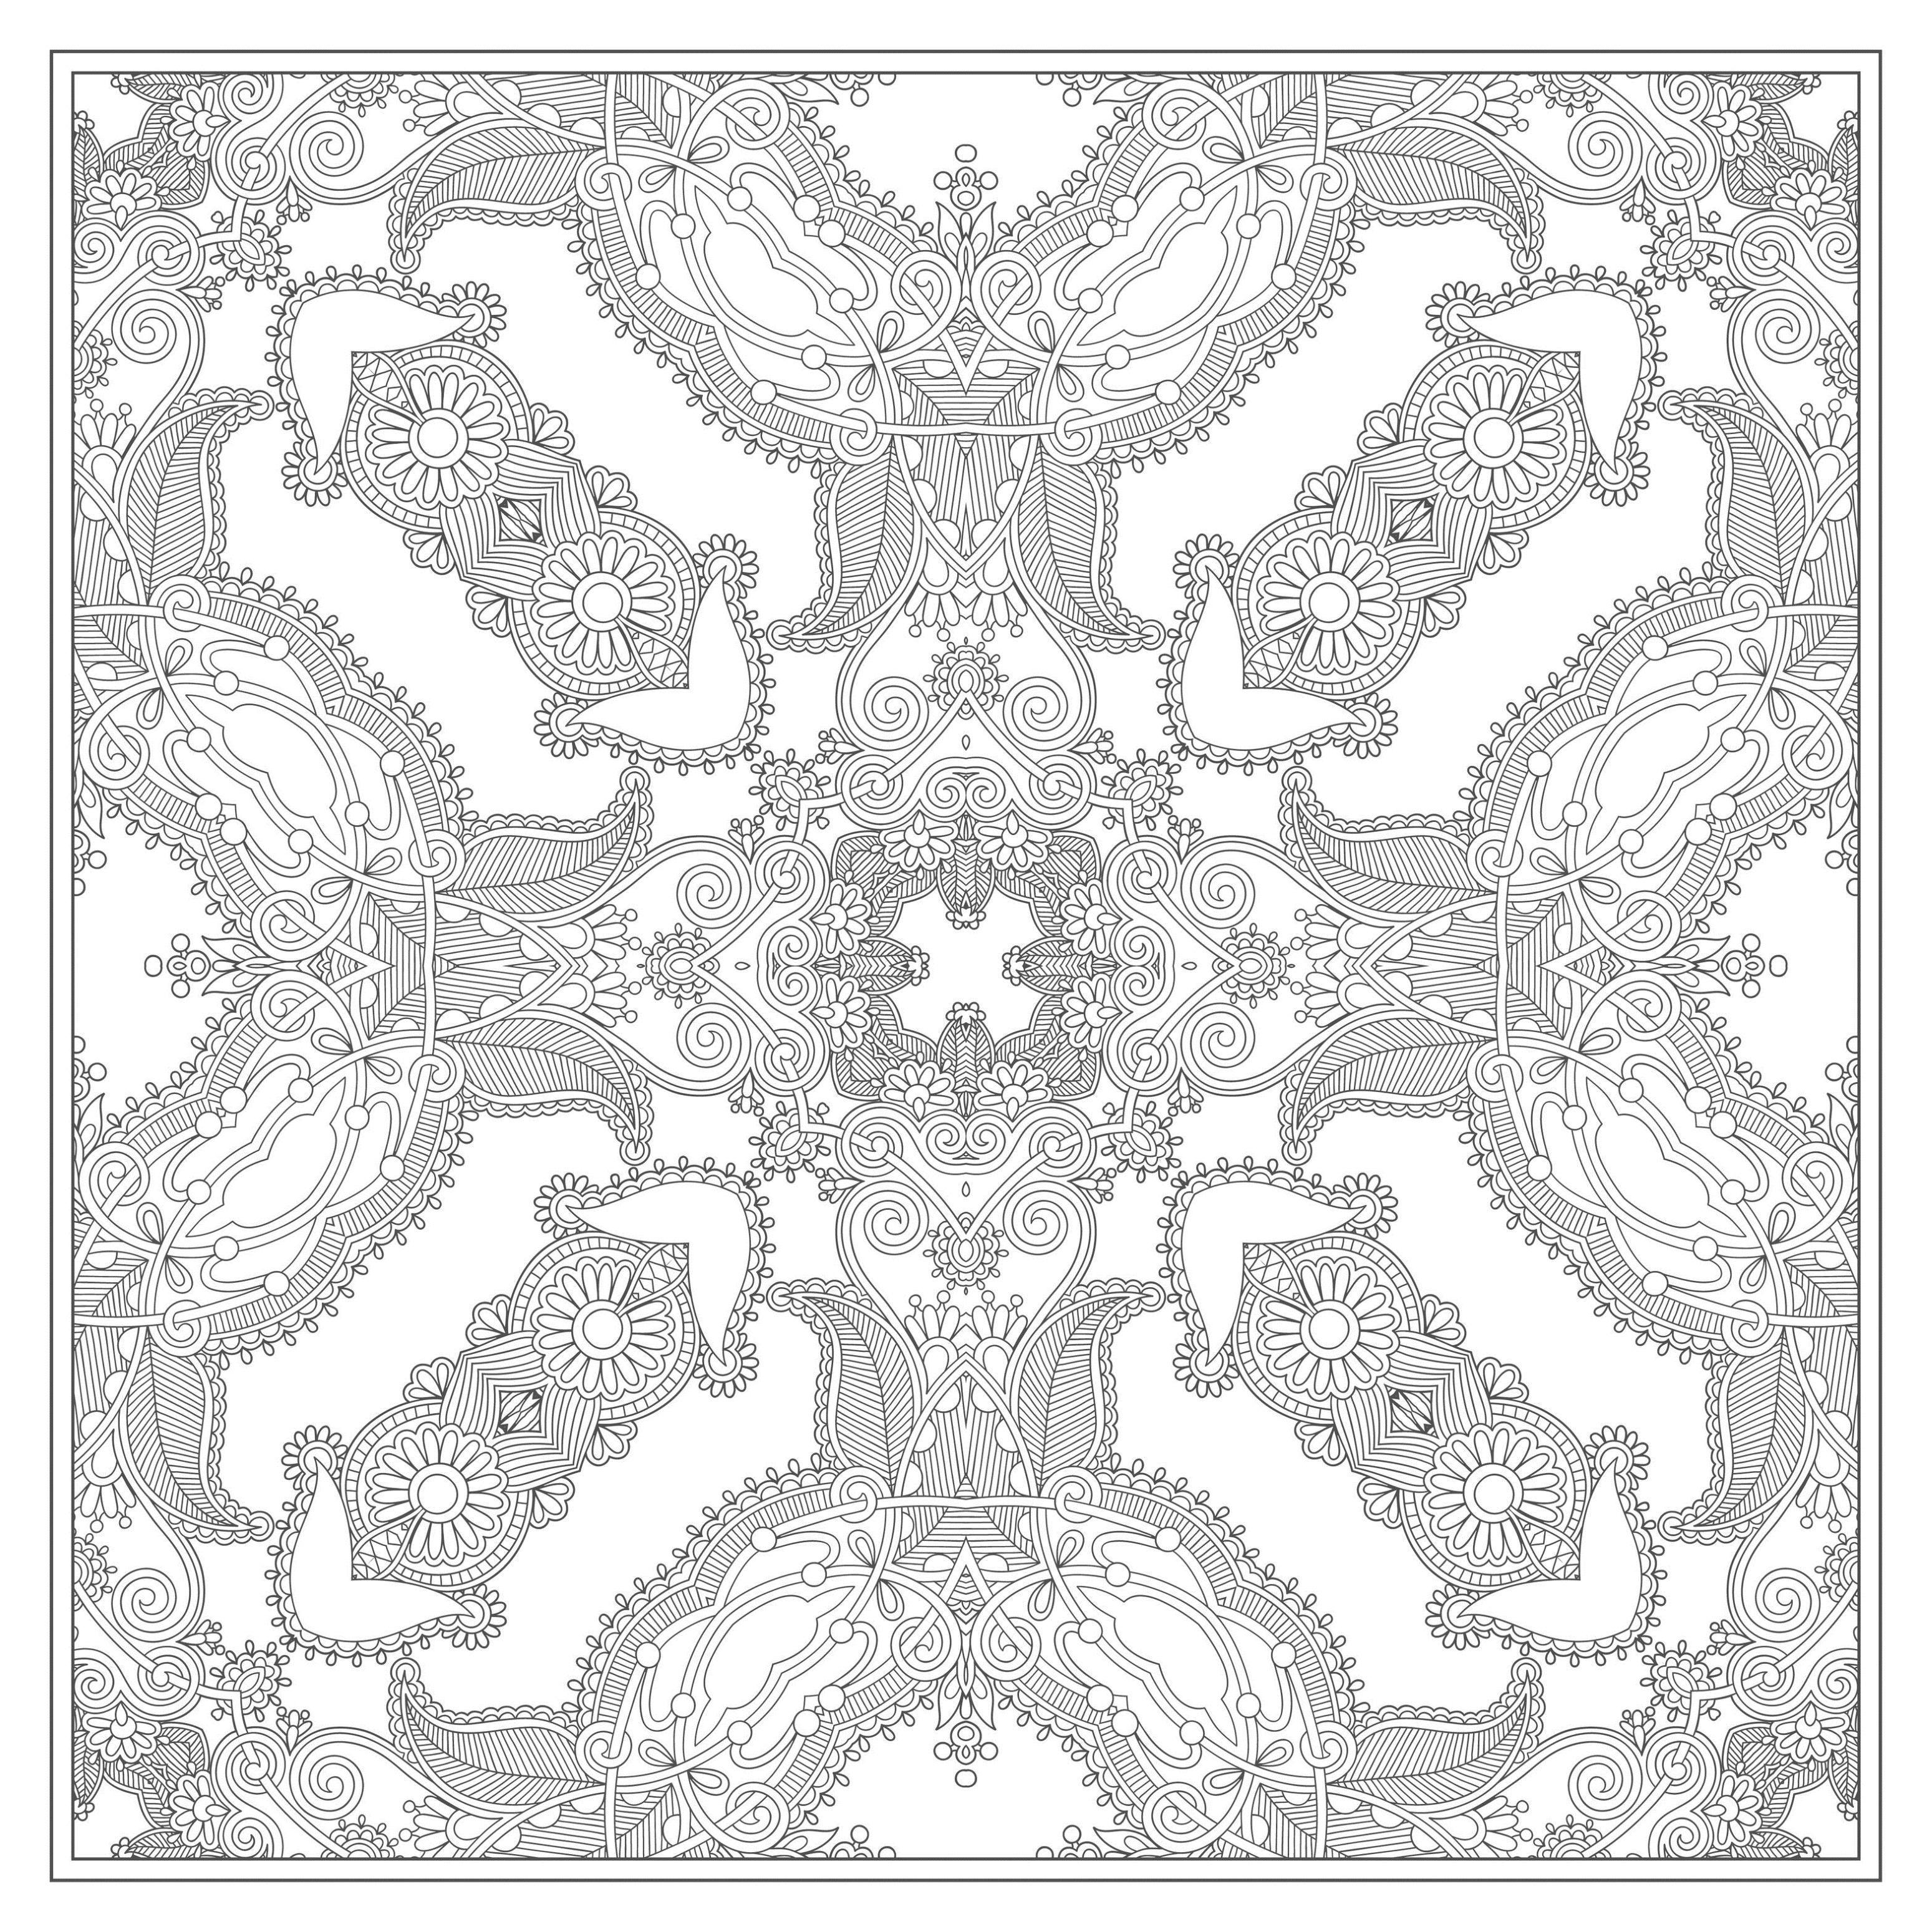 K coloring pages for adults - Free Coloring Page Coloring Adult Squared Mandala By Karakotsya 4